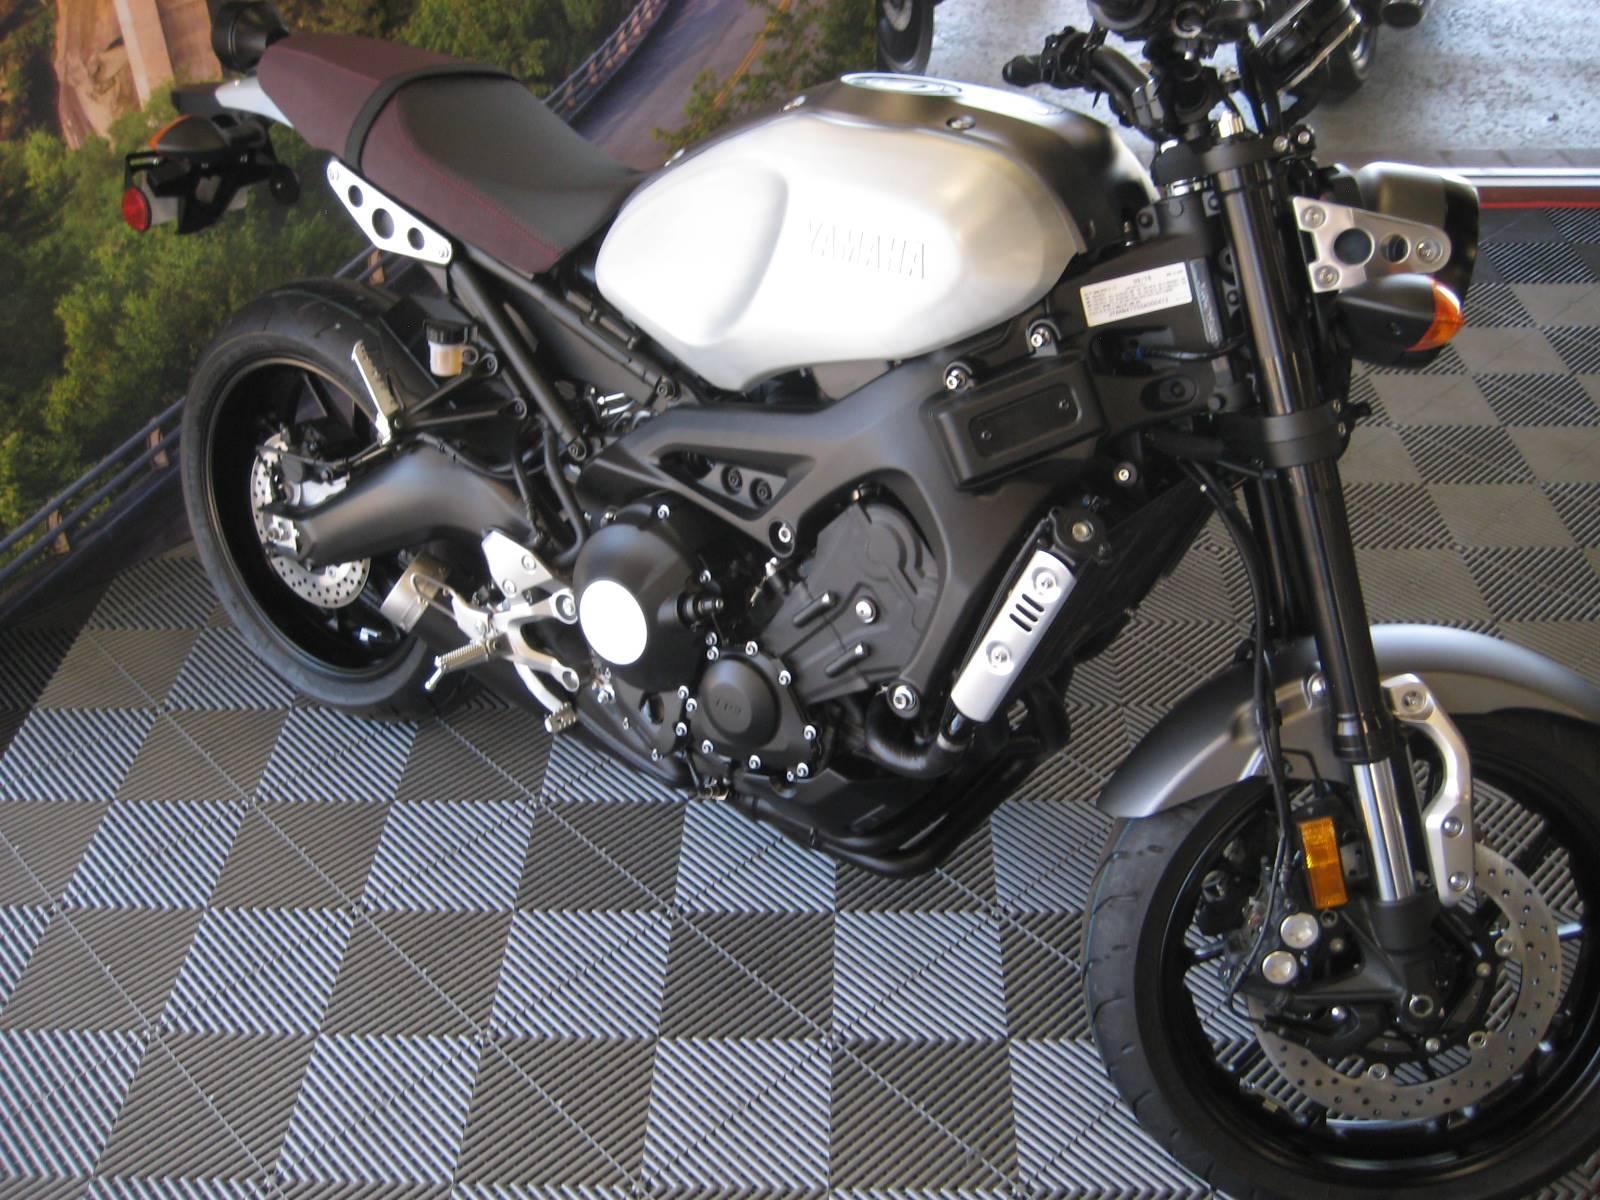 2016 Yamaha XSR900 4